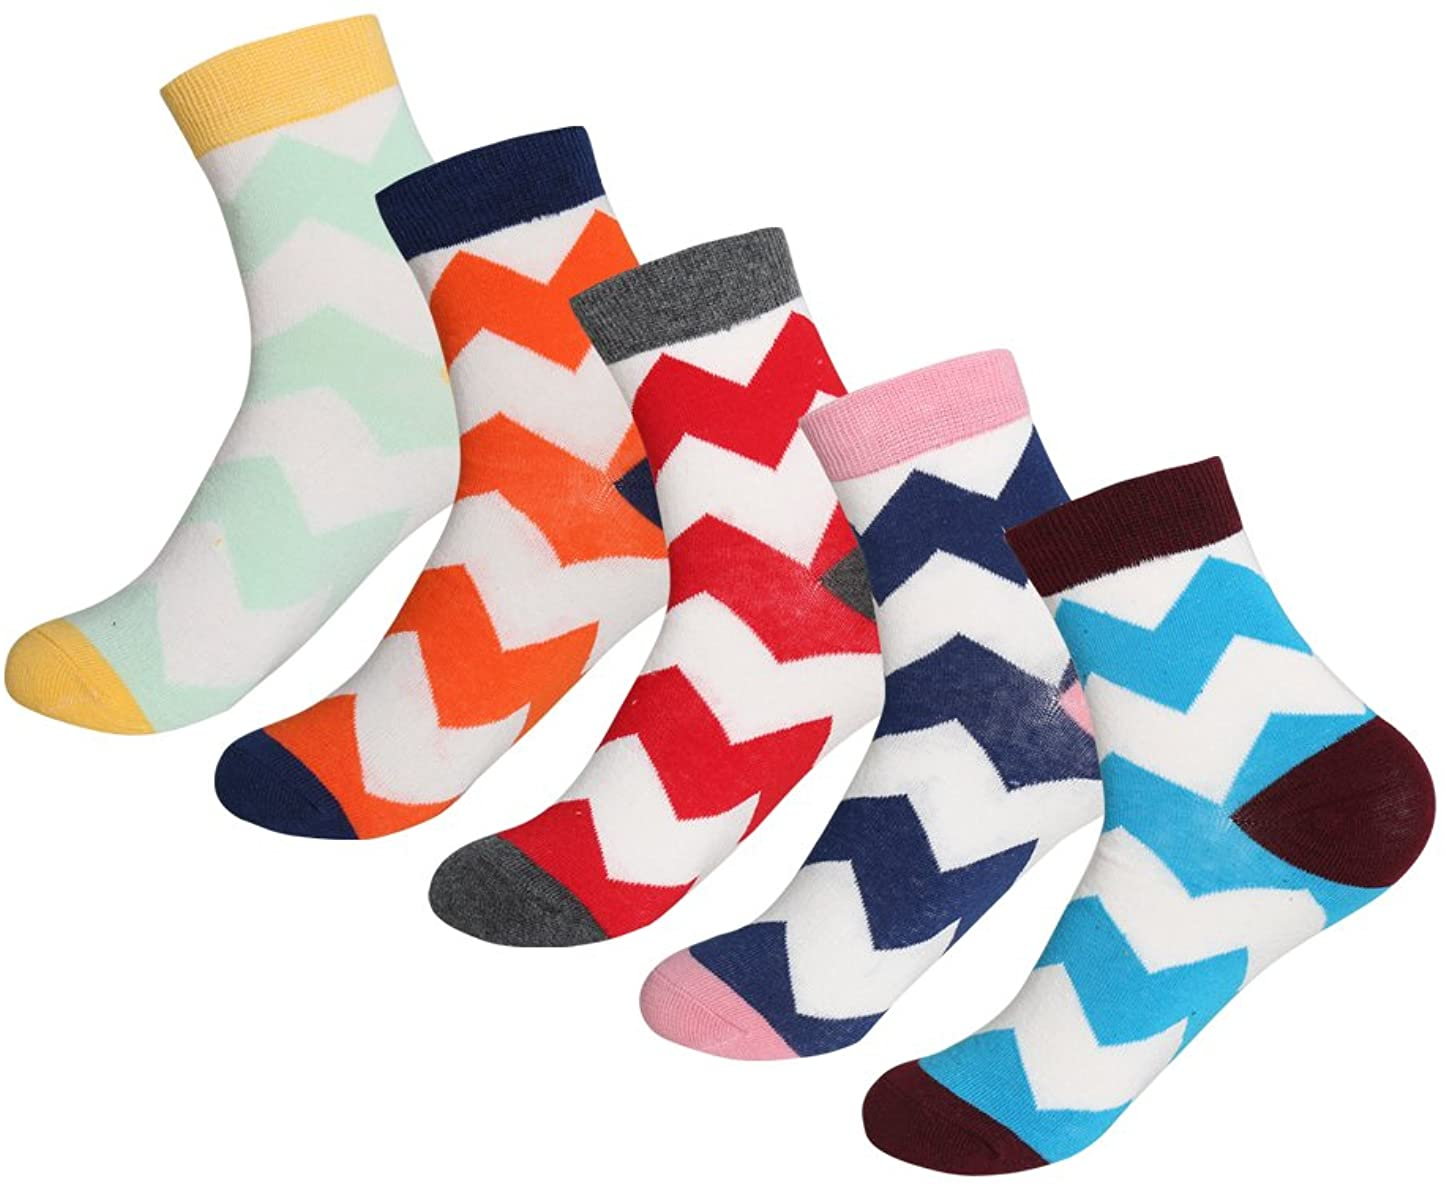 uxcell Women 5 Pack Cotton Blend Multi Pattern Crew Socks